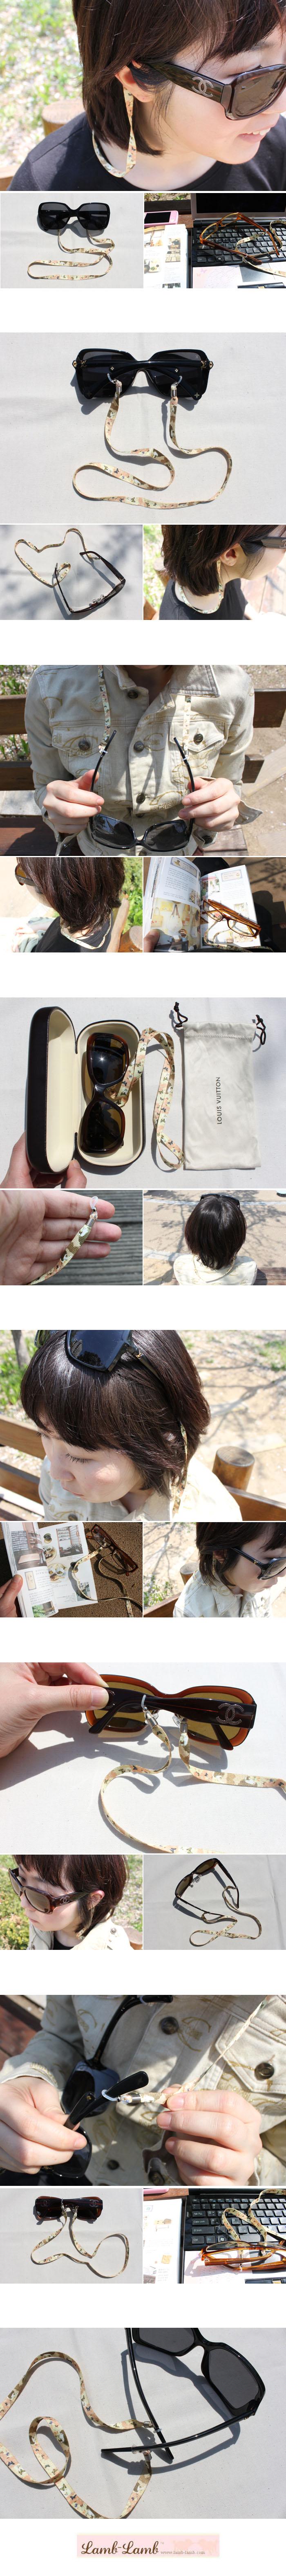 eyeglass strap -butterfly - 램램, 3,000원, 안경/선글라스, 안경